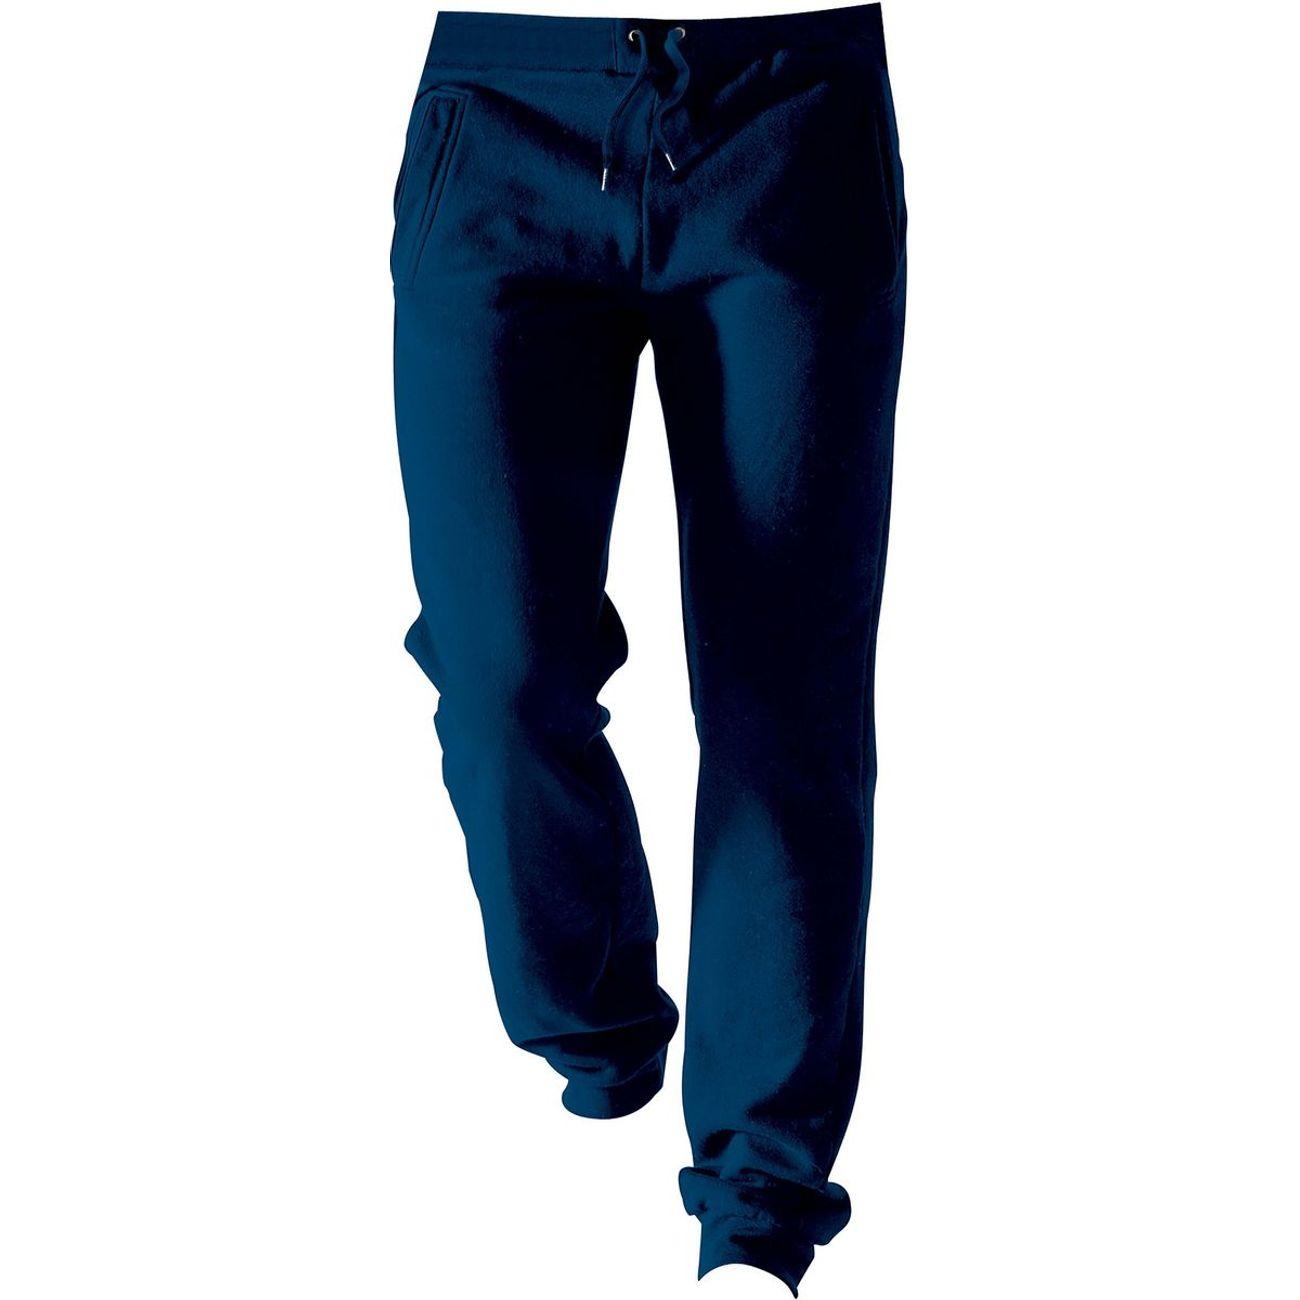 Jogging Unisexe K700 Pantalon Bleu Marine O0w8Pkn